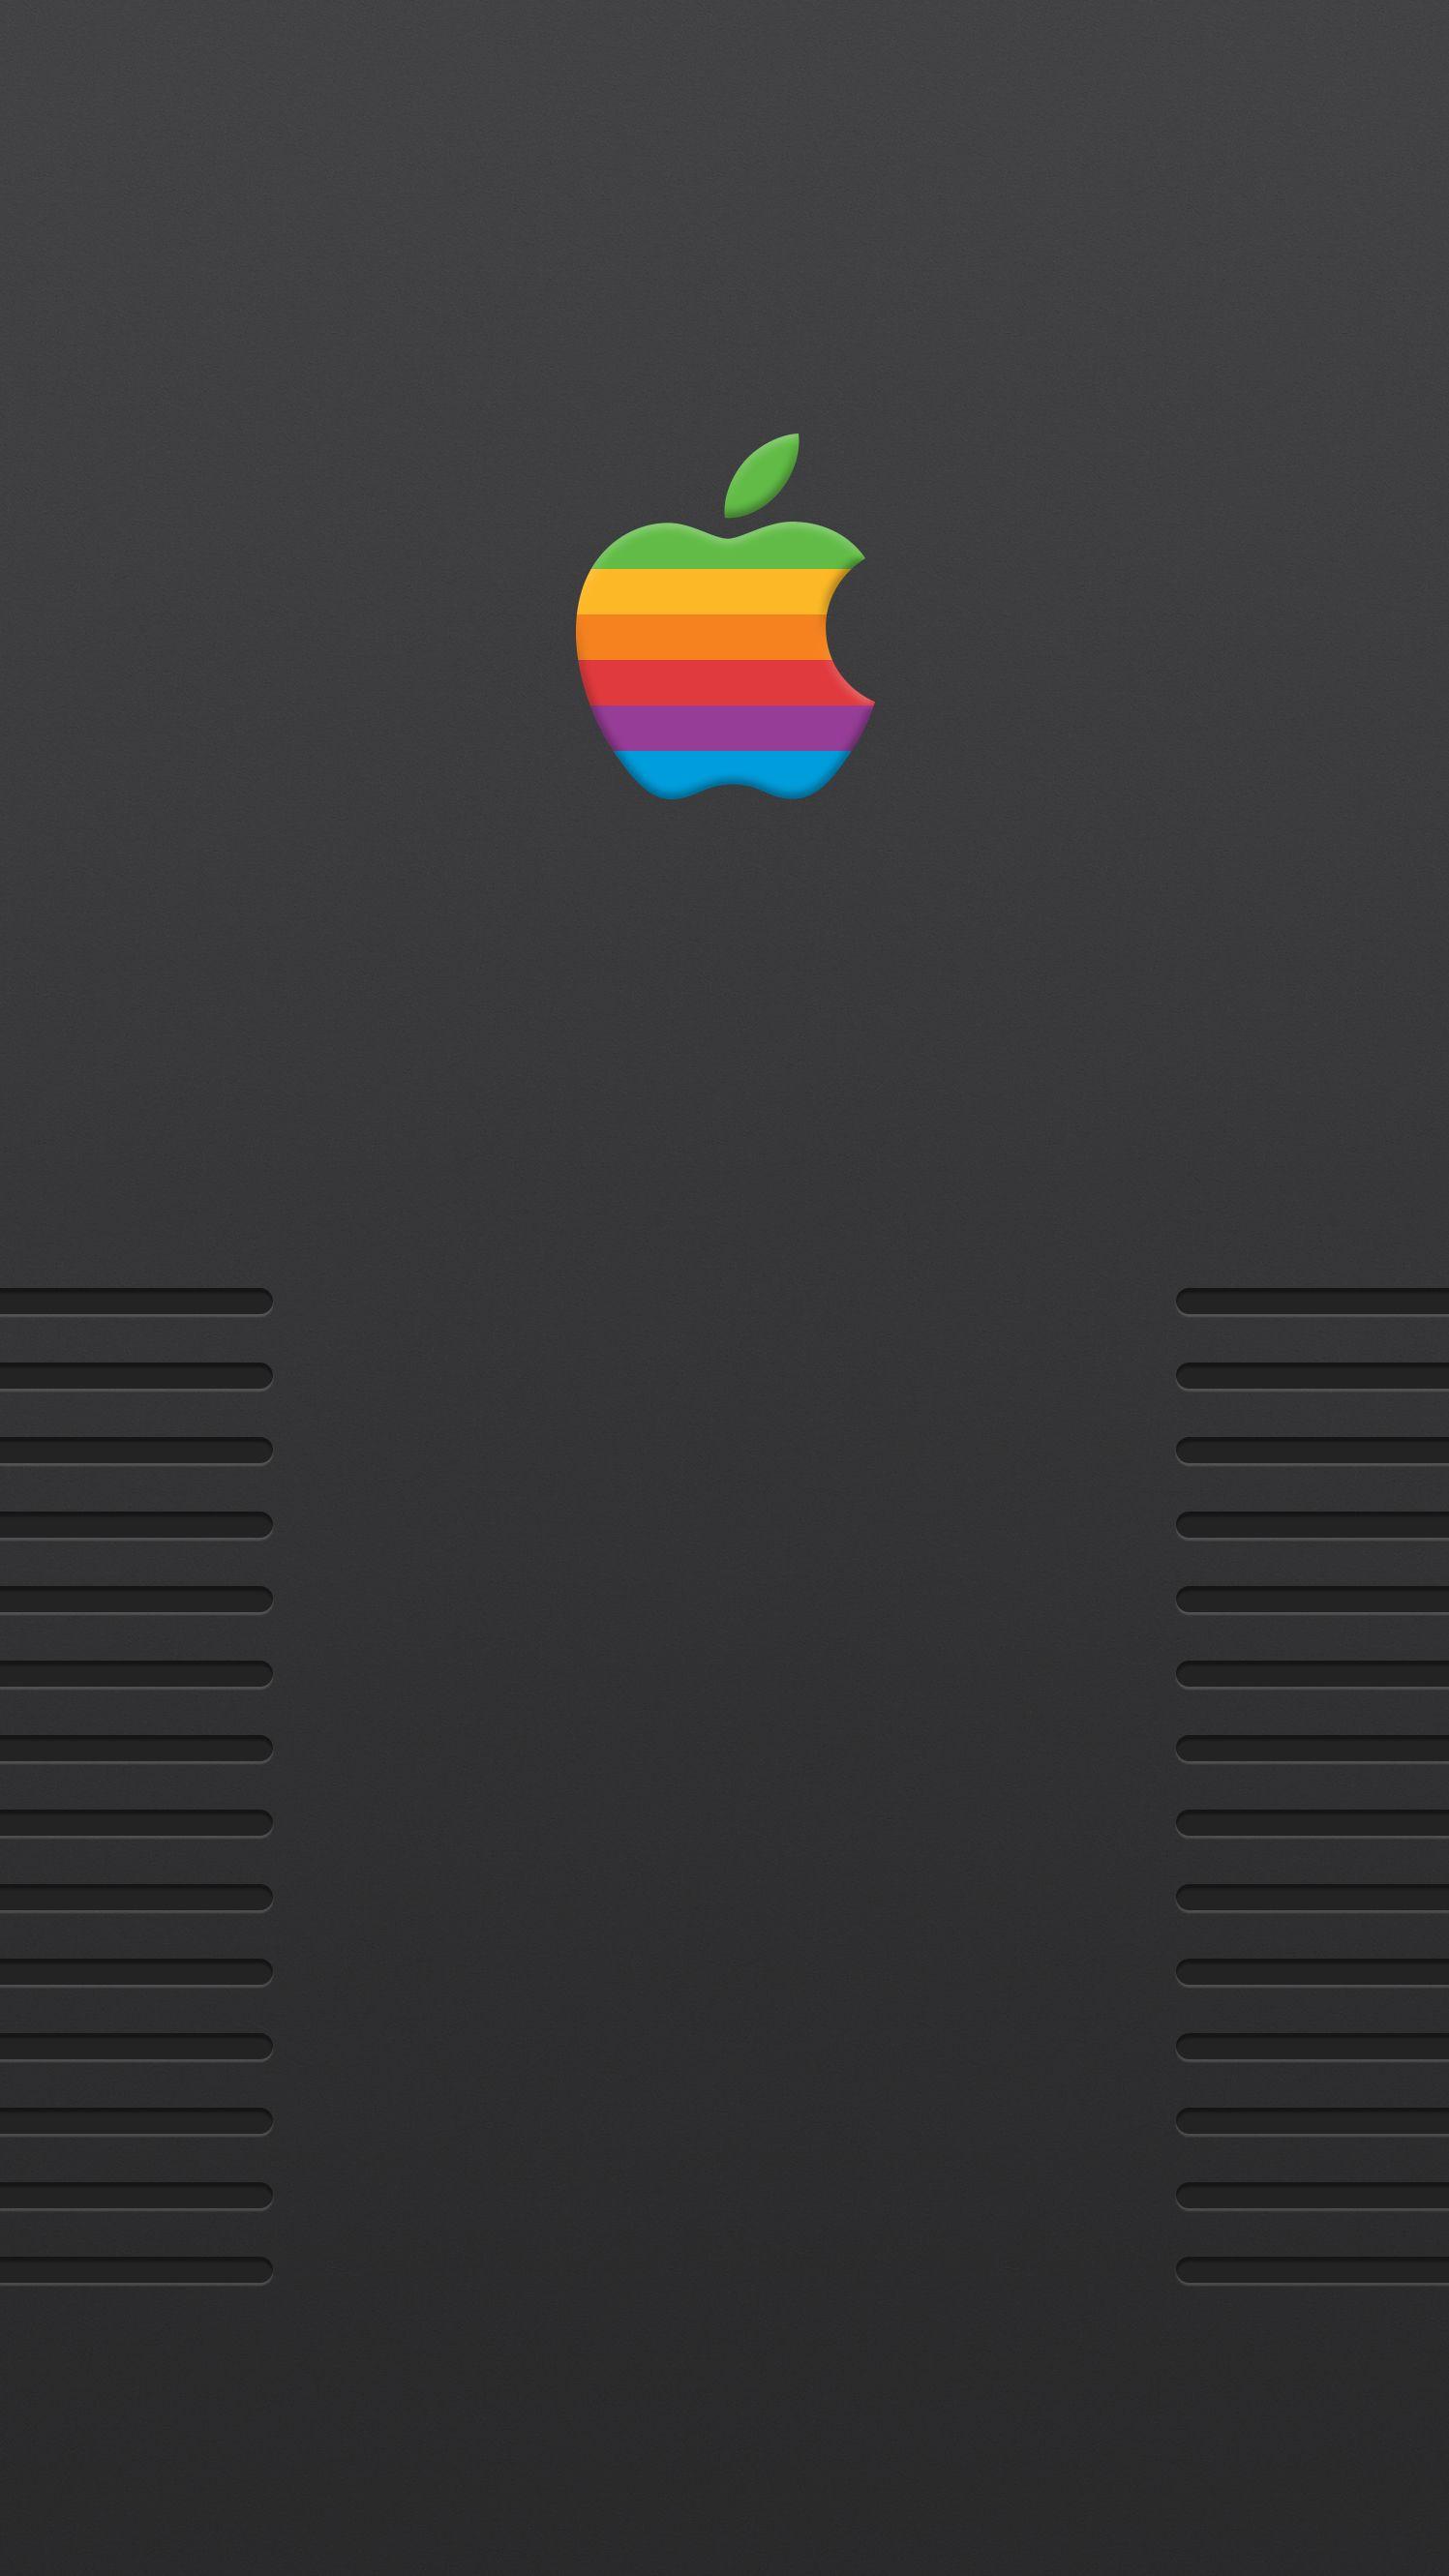 Iphone Wallpaper Retro : iphone, wallpaper, retro, IPhone, Retro, Apple, Wallpaper, Images, Iphone,, Iphone, Original,, Vintage